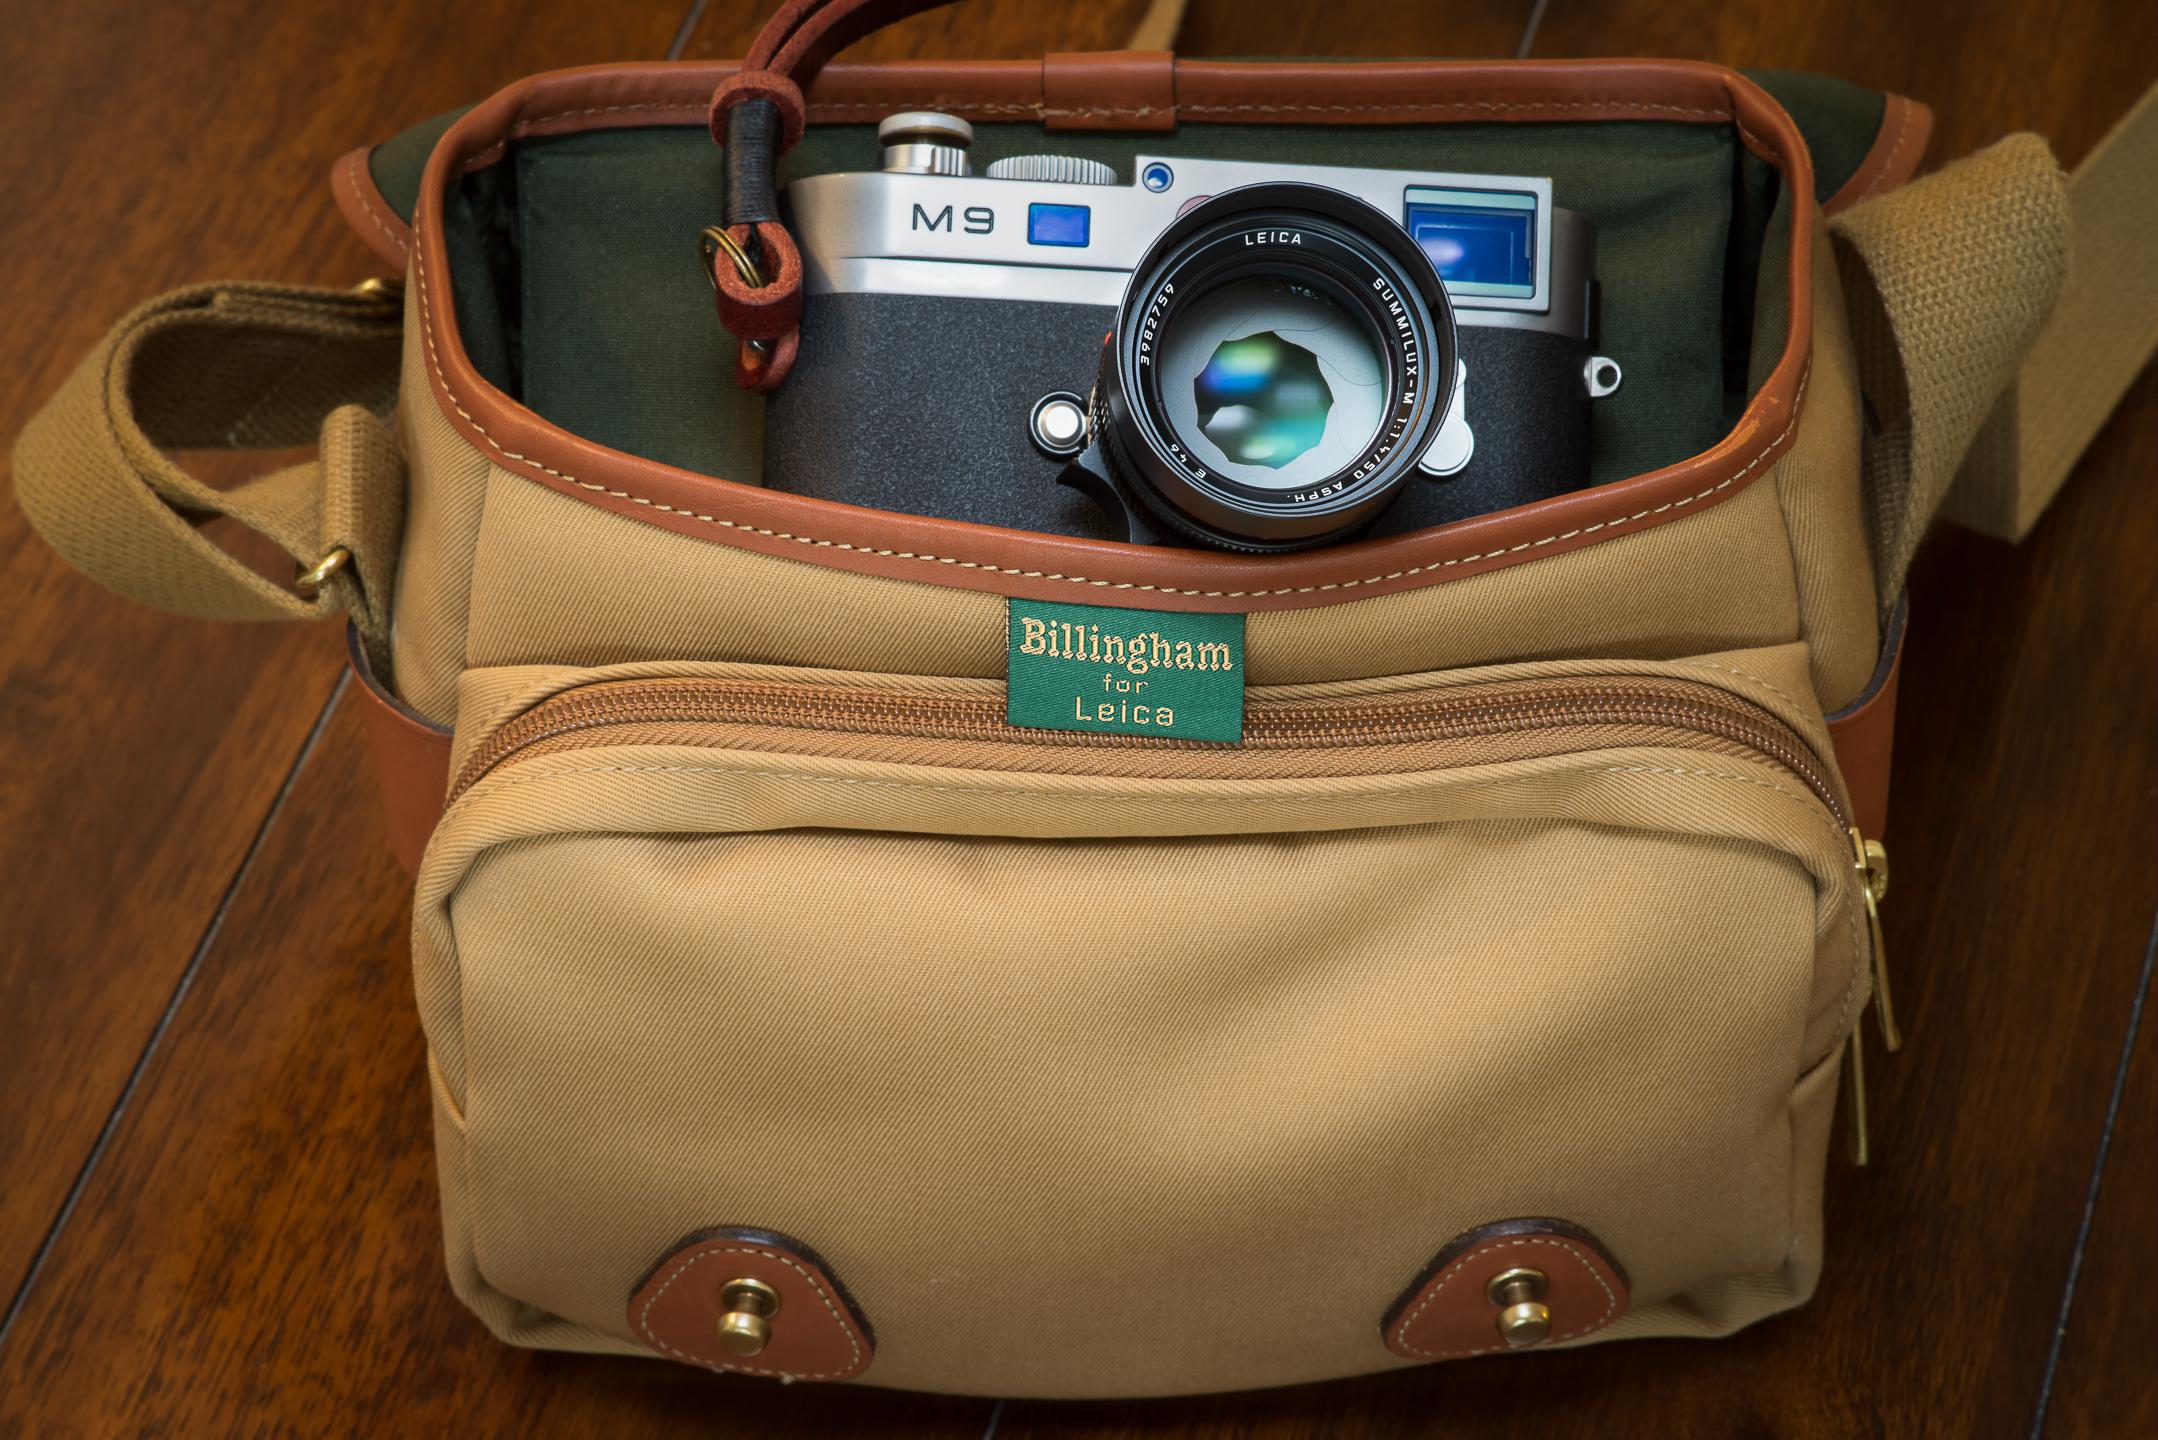 Leicaand Bag